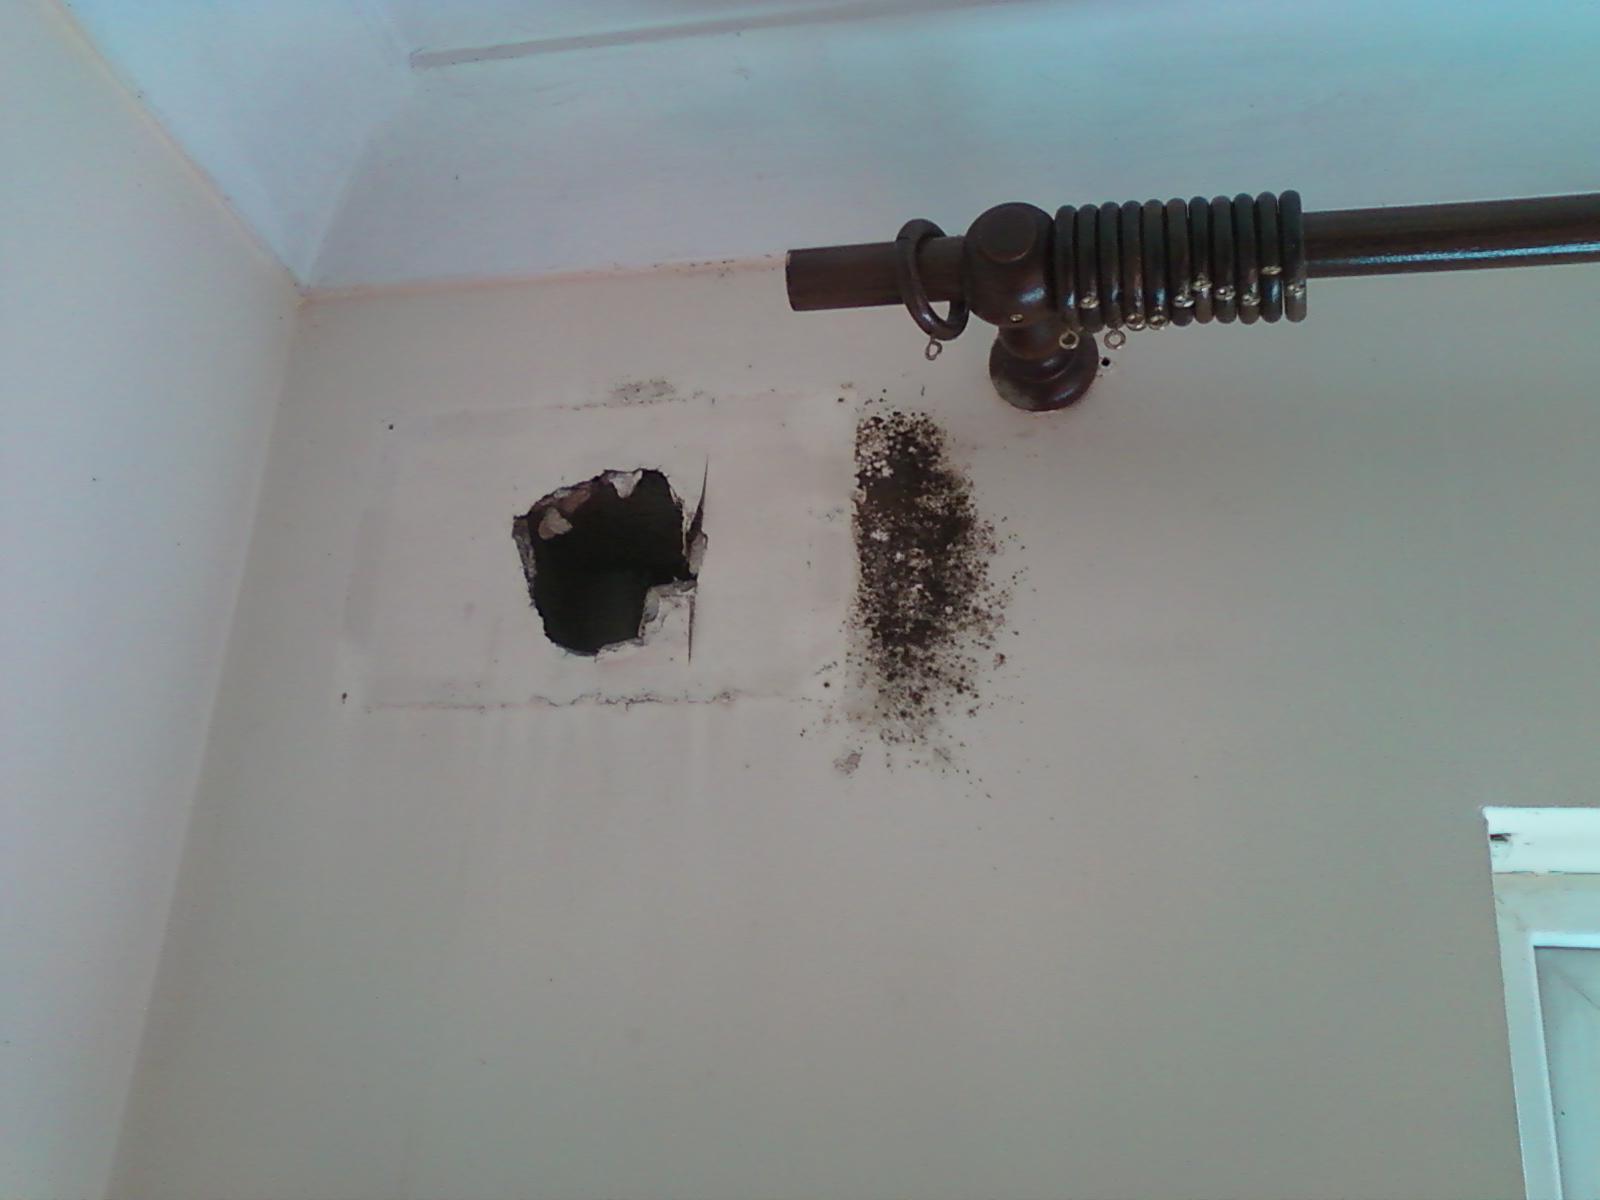 Mould spread around vent